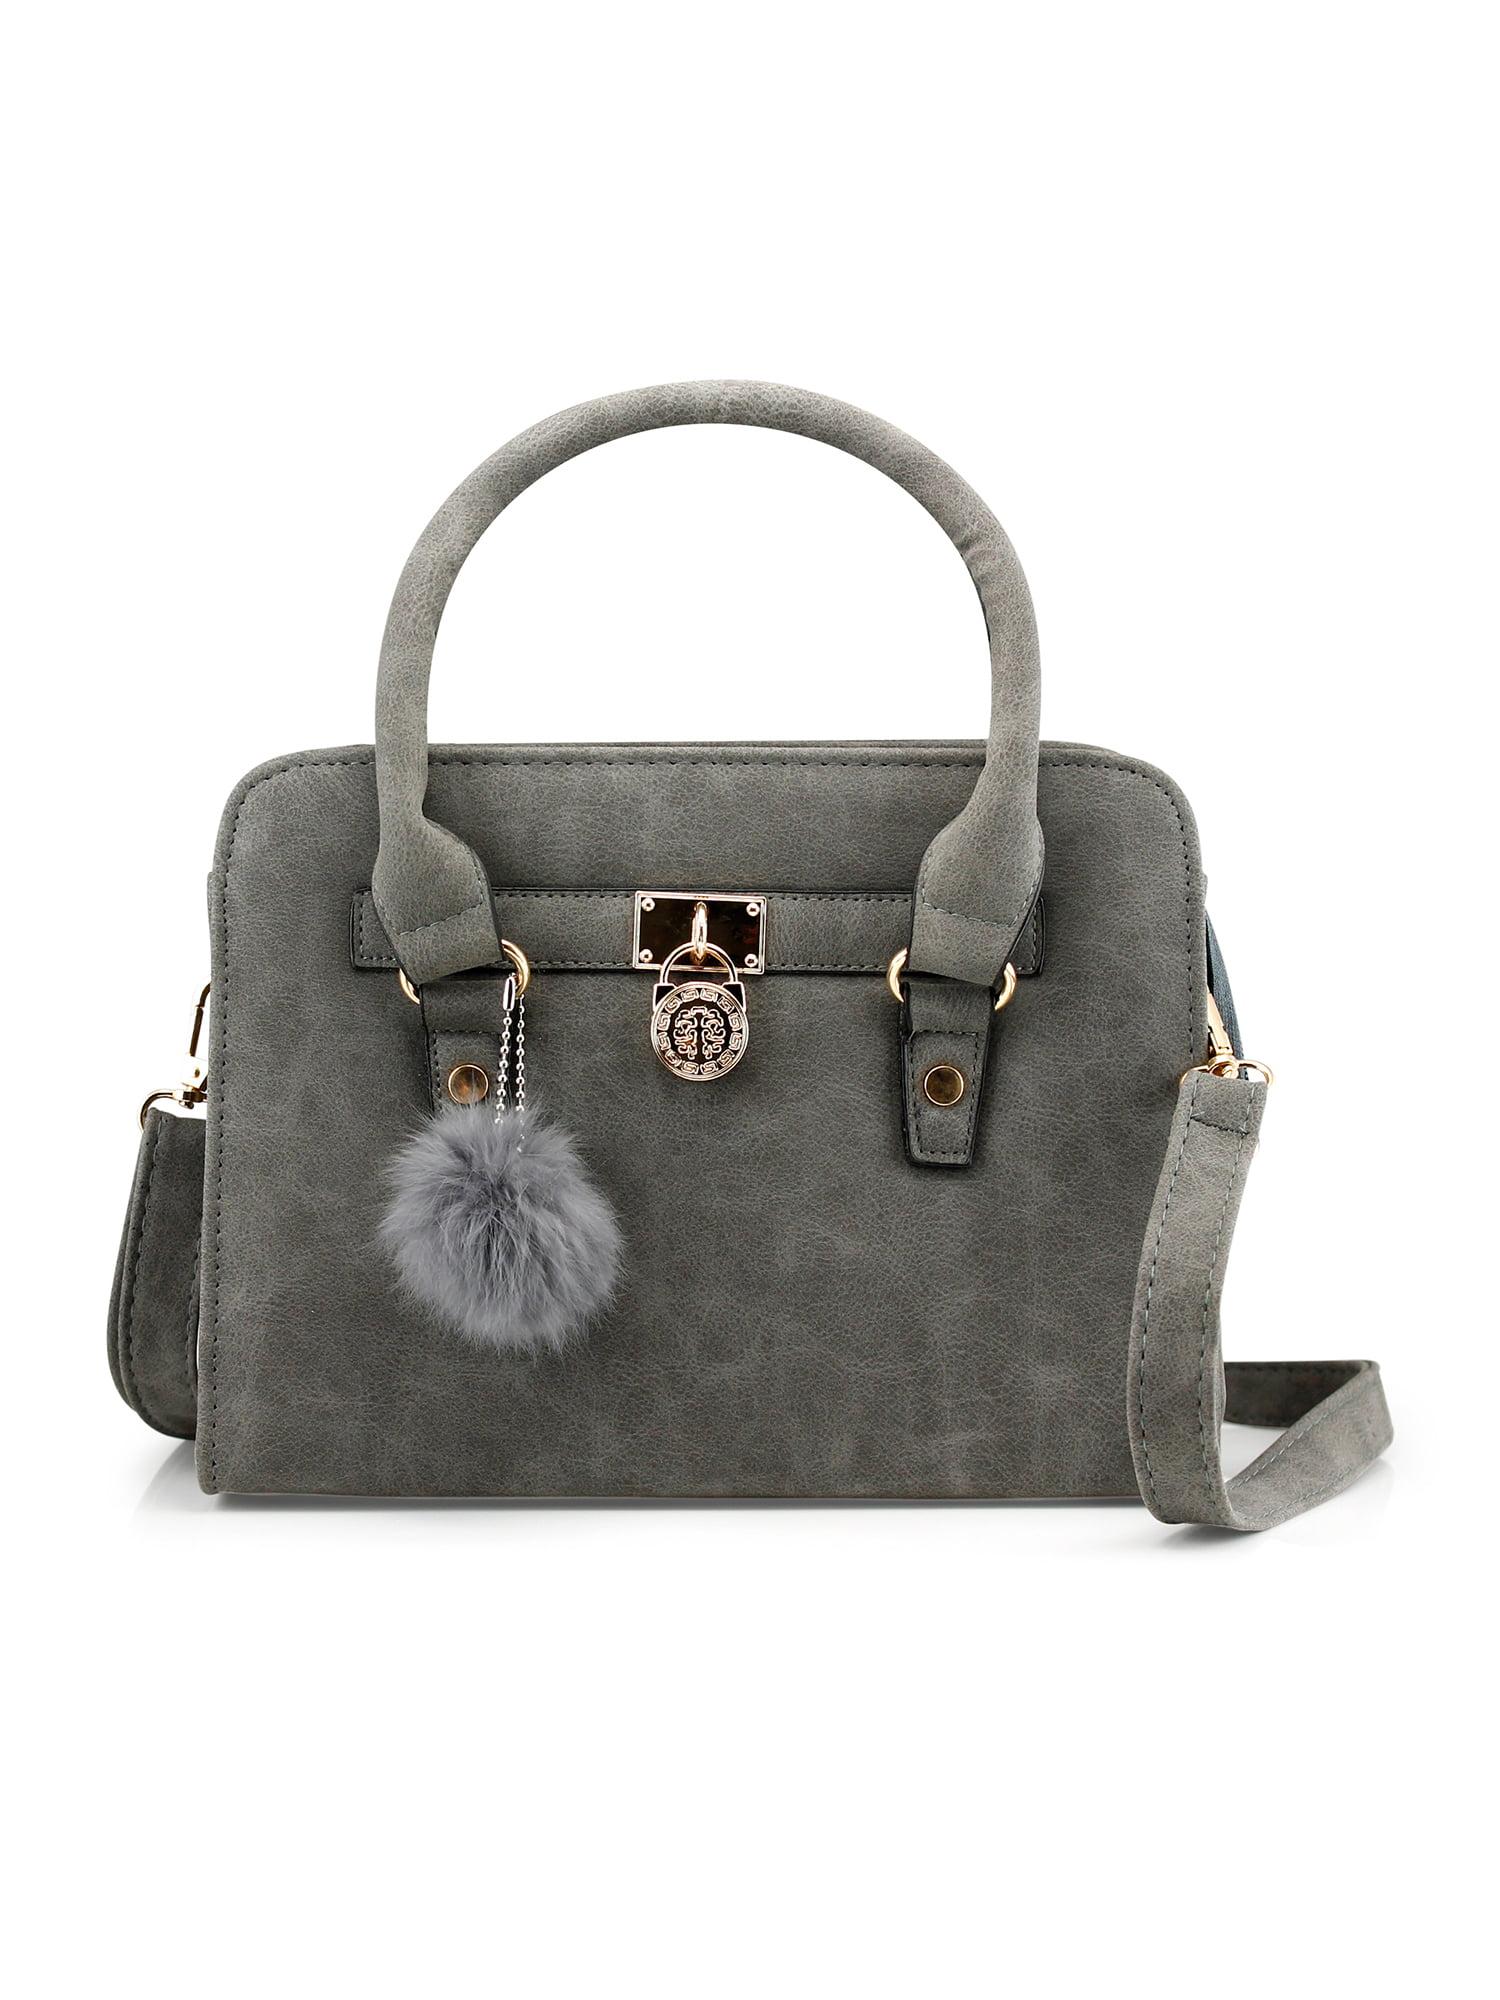 Lady Women Lock Faux Leather Tote Hobo Shoulder Bag Cute Purse fur...